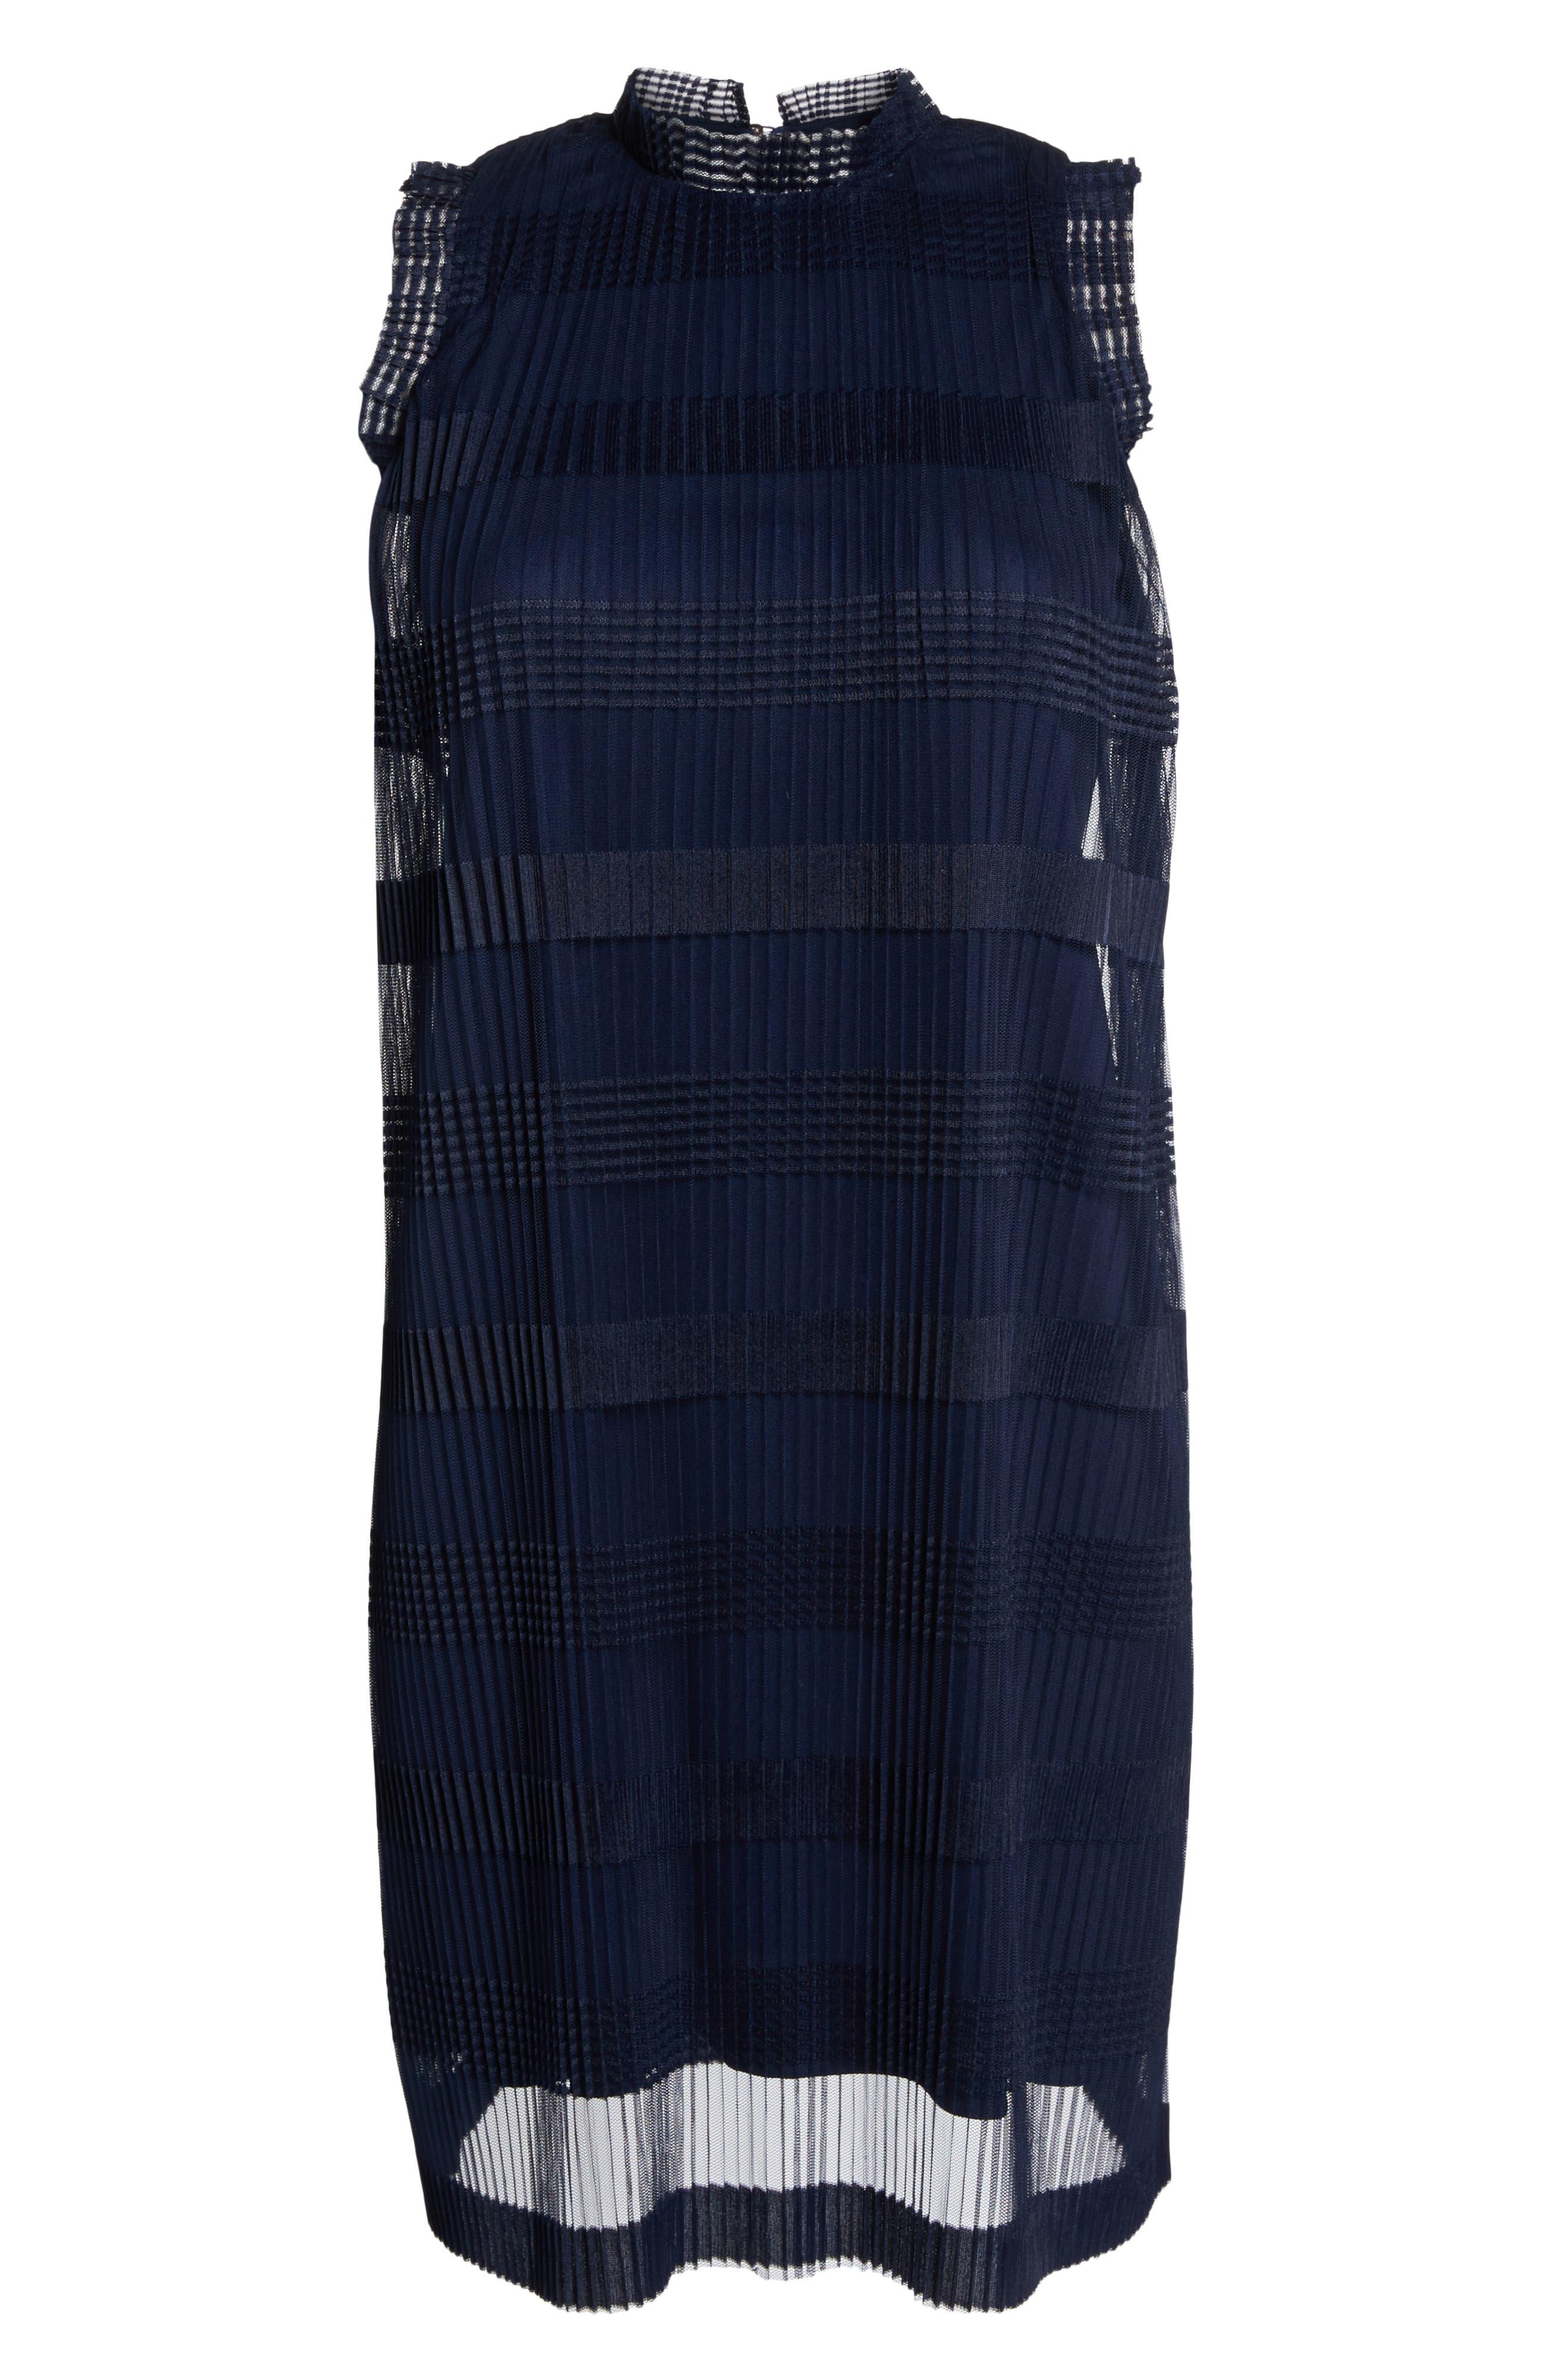 JULIA JORDAN, Stripe Pleated Chiffon Shift Dress, Alternate thumbnail 7, color, NAVY